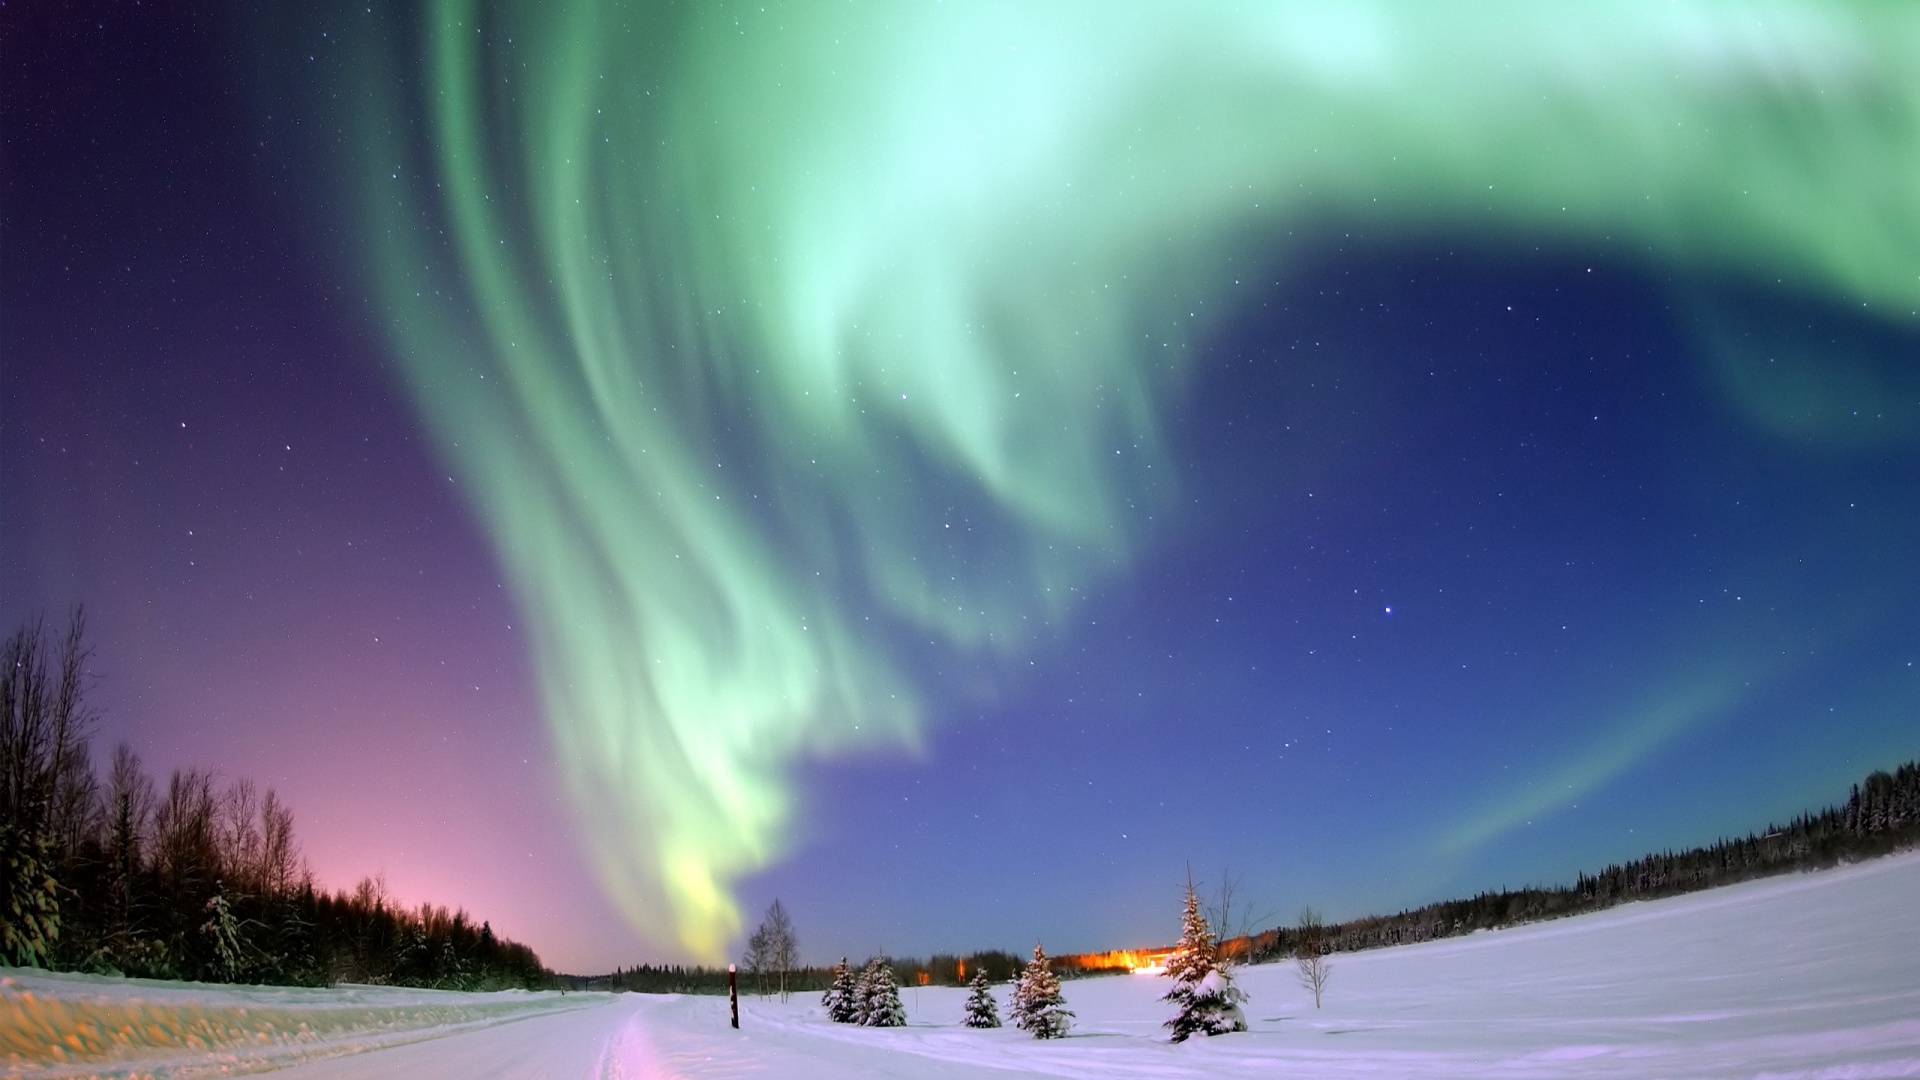 Aurora Borealis Wallpapers | HD Wallpapers